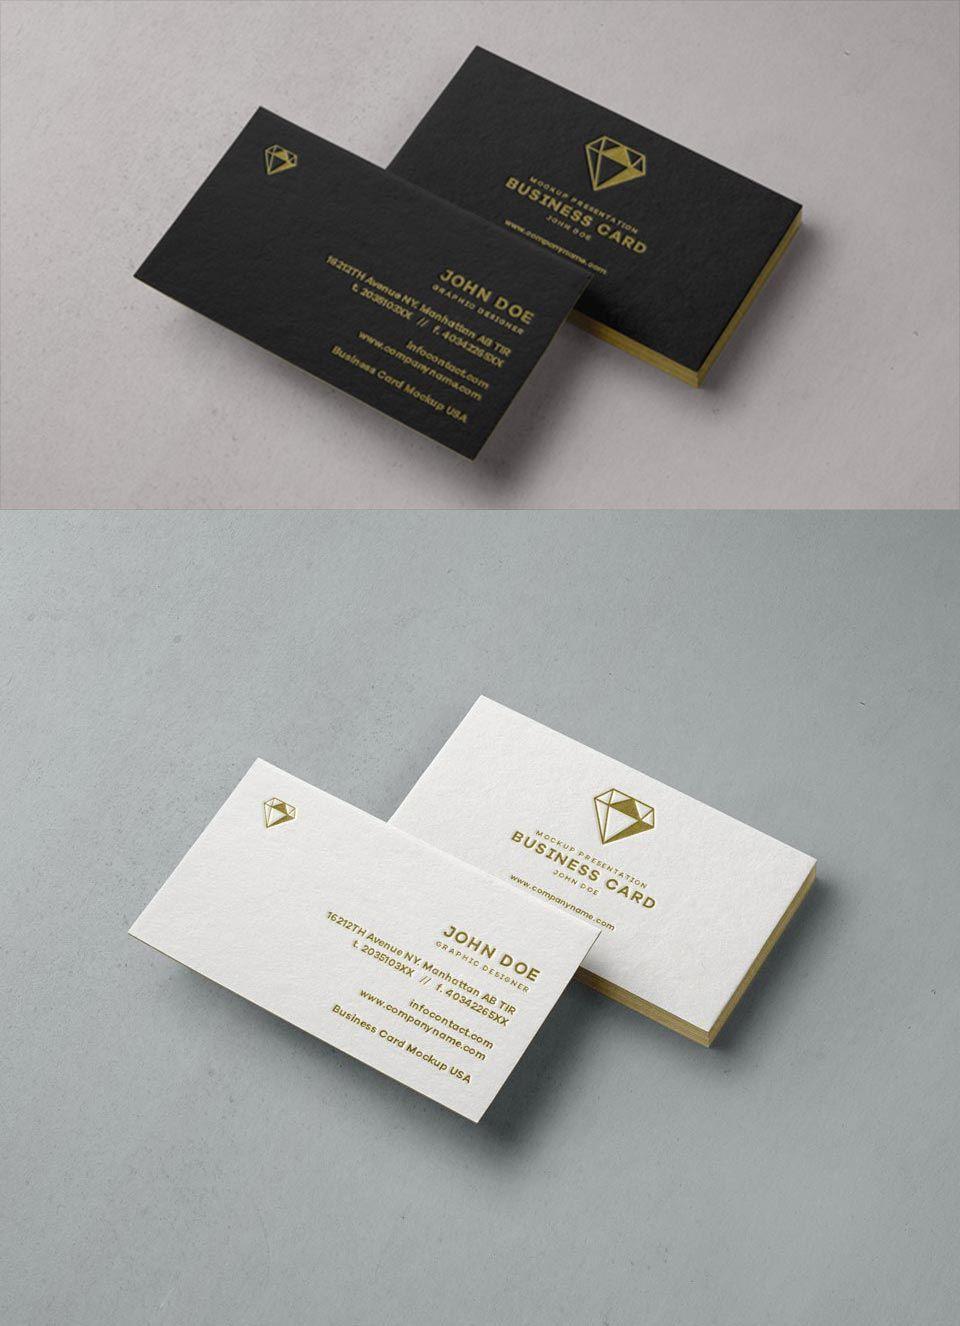 Free Psd Business Card Mockup Business Card Mock Up Business Card Psd Free Business Card Mockup